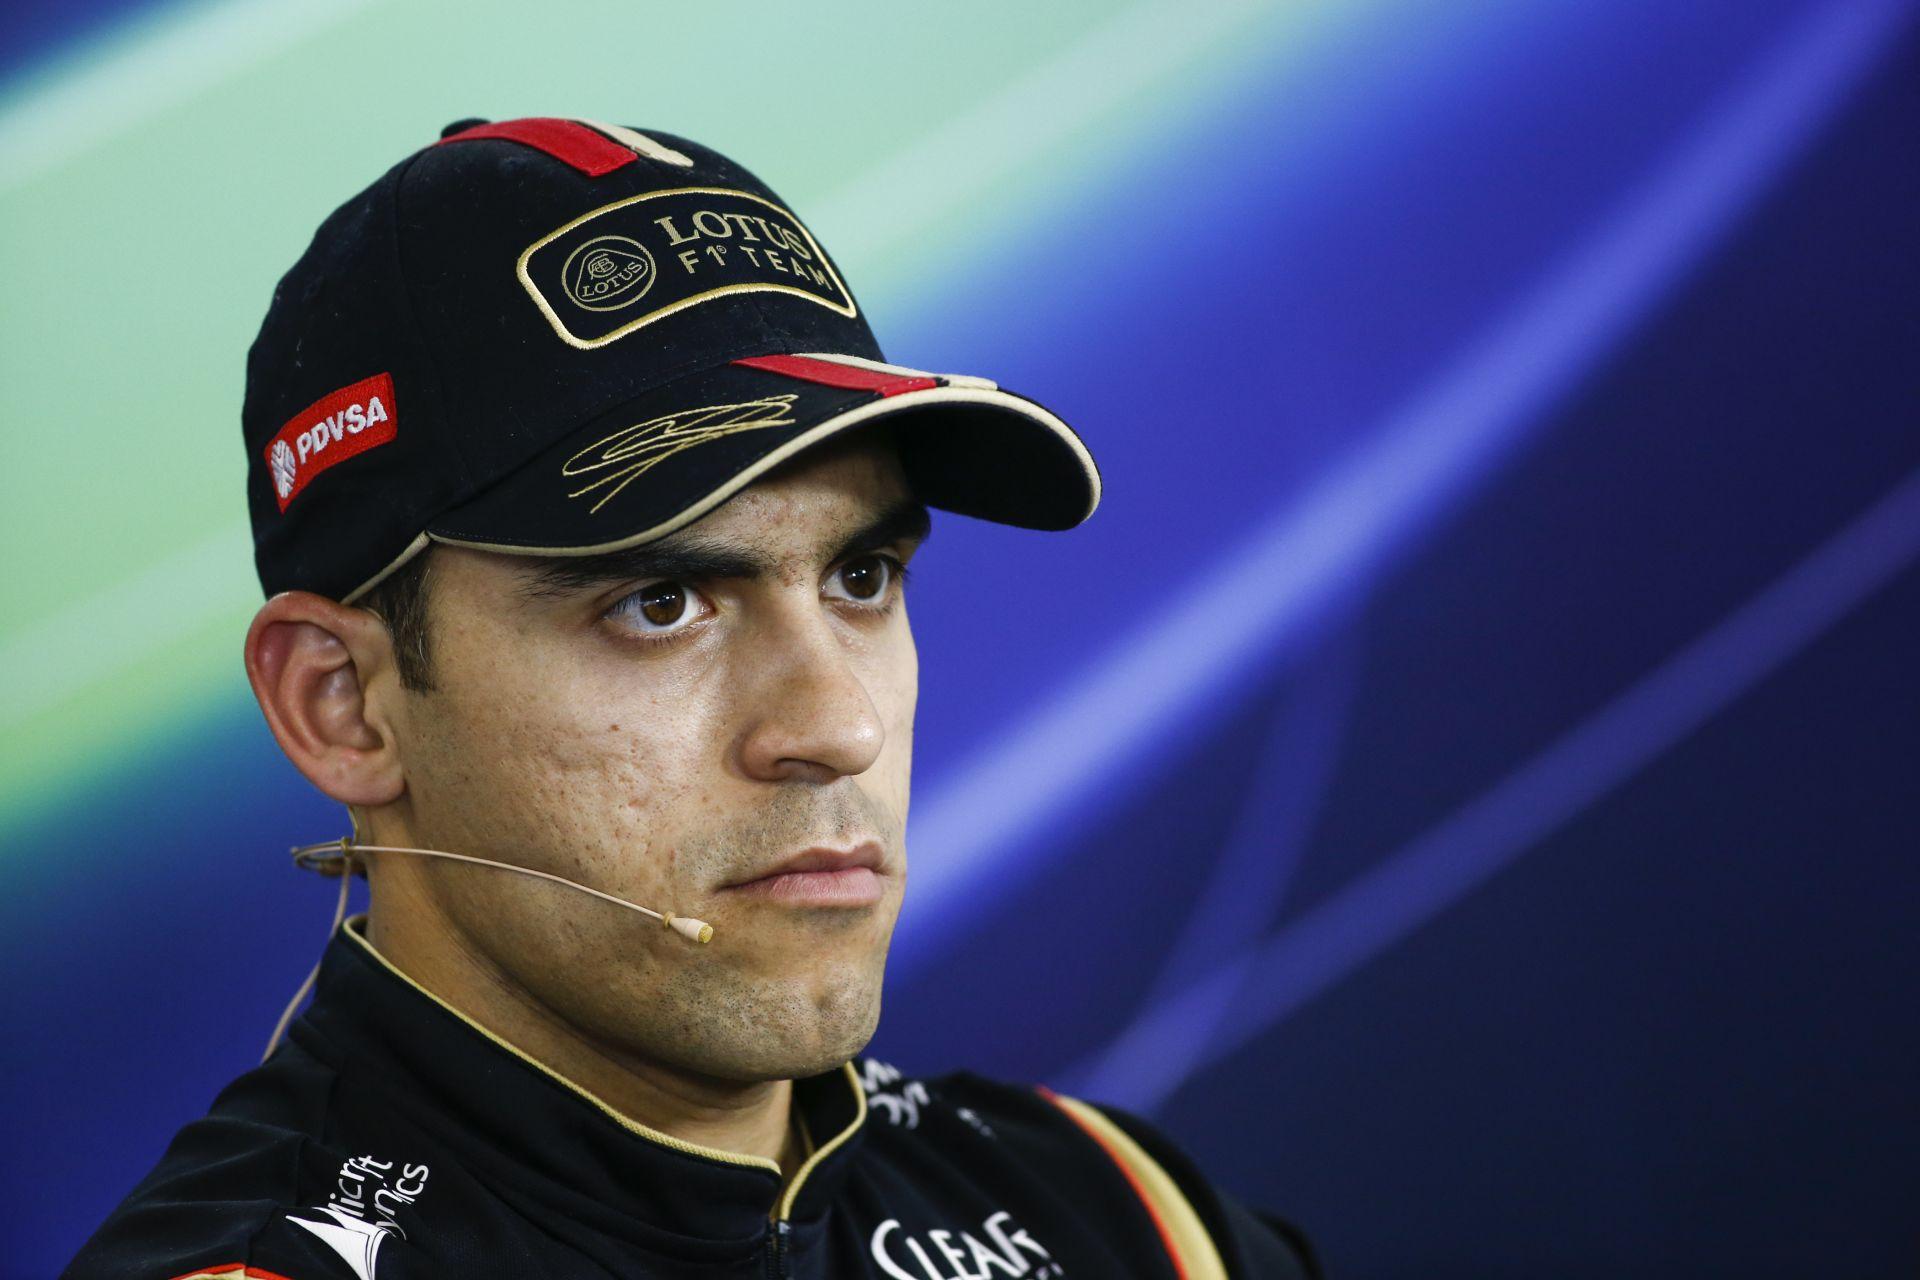 Maldonado: Grosjeannak a Lotusnál kell maradnia!